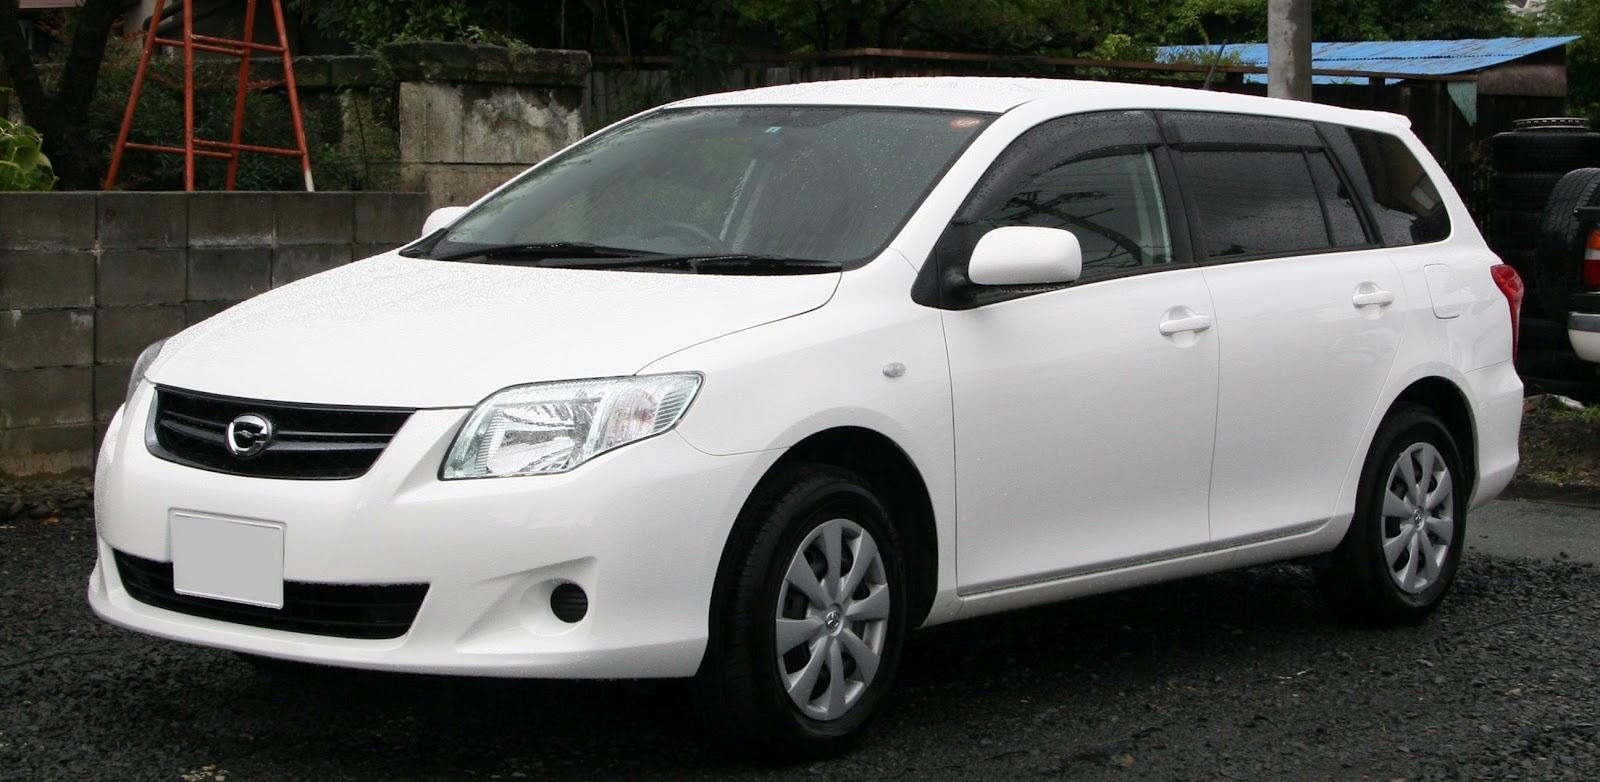 http://1.bp.blogspot.com/-RS4zYMPzy4o/TzTlRHLX3kI/AAAAAAAACn8/af6wNo8k_Gg/s1600/Toyota_Corolla_Fielder.jpg